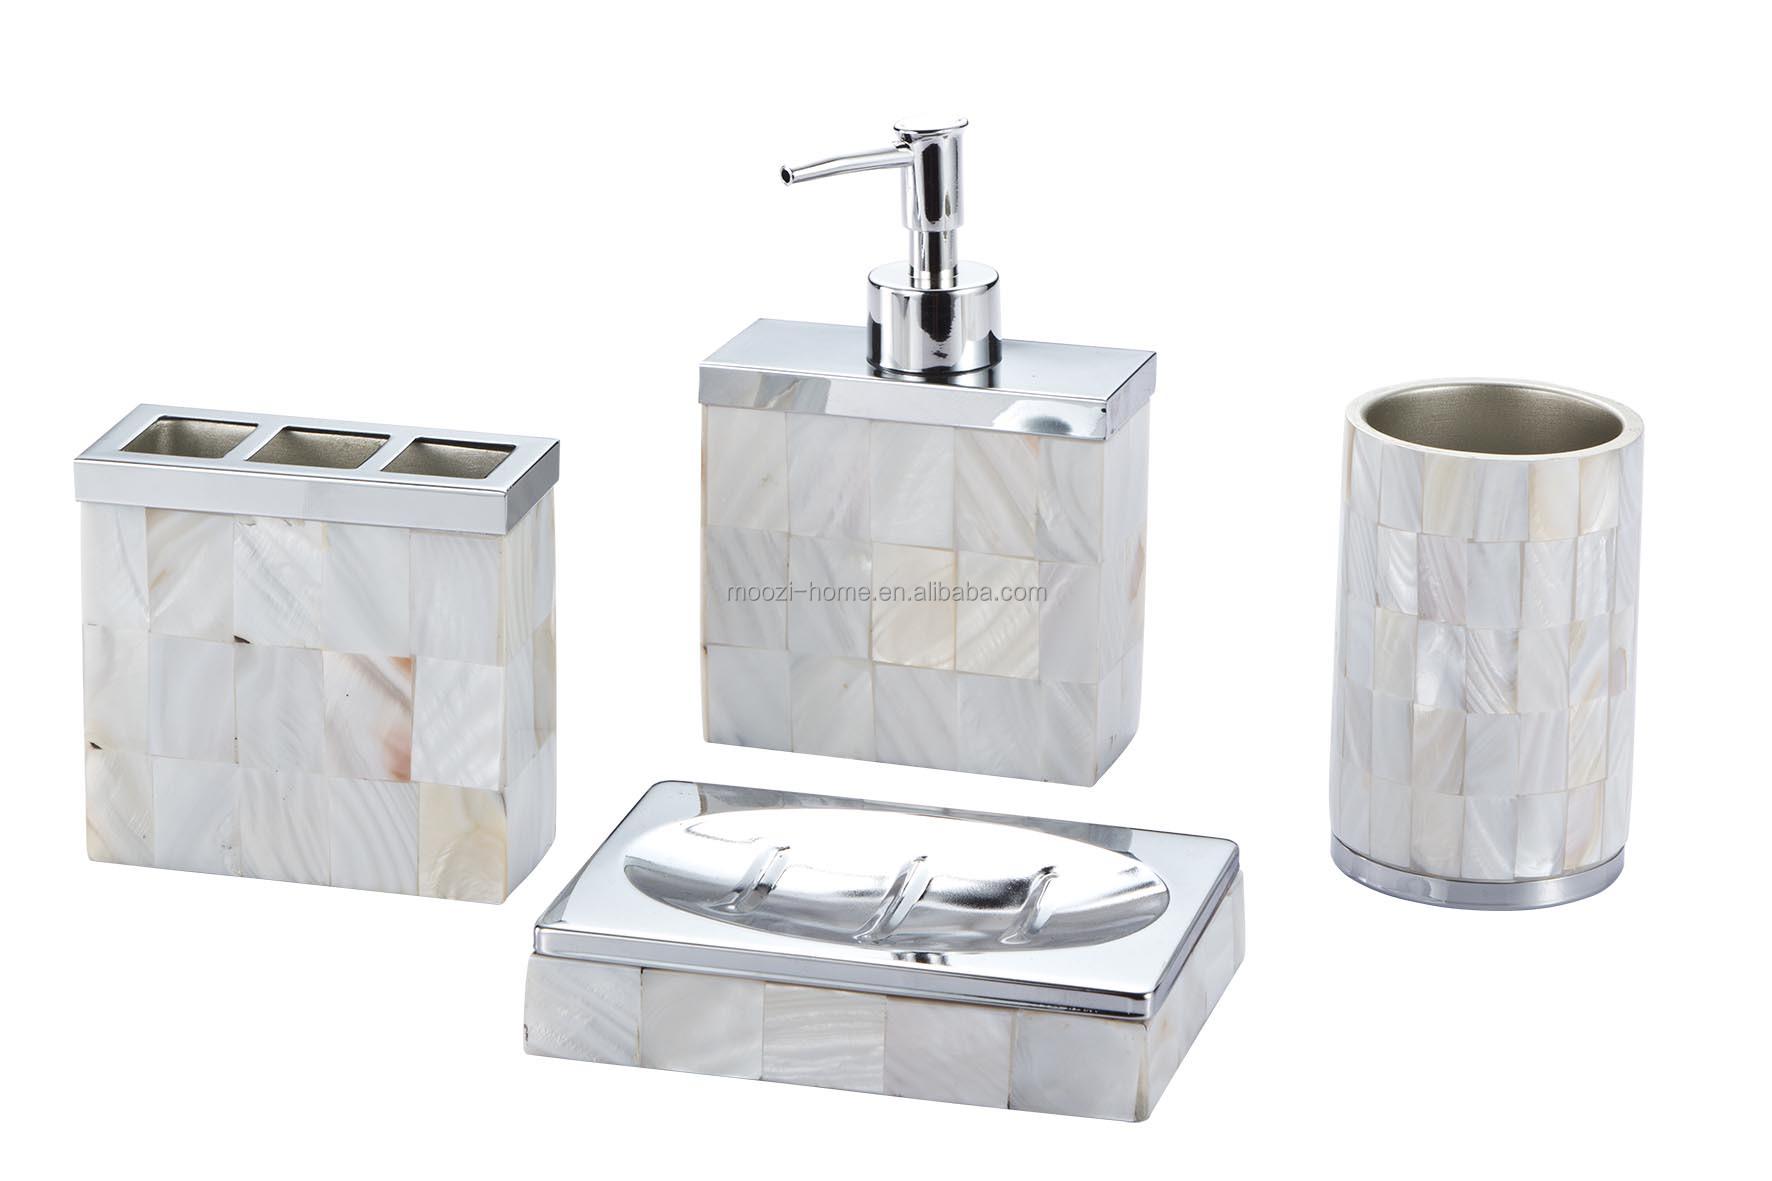 bathroom soap dispenser sets  My Web Value